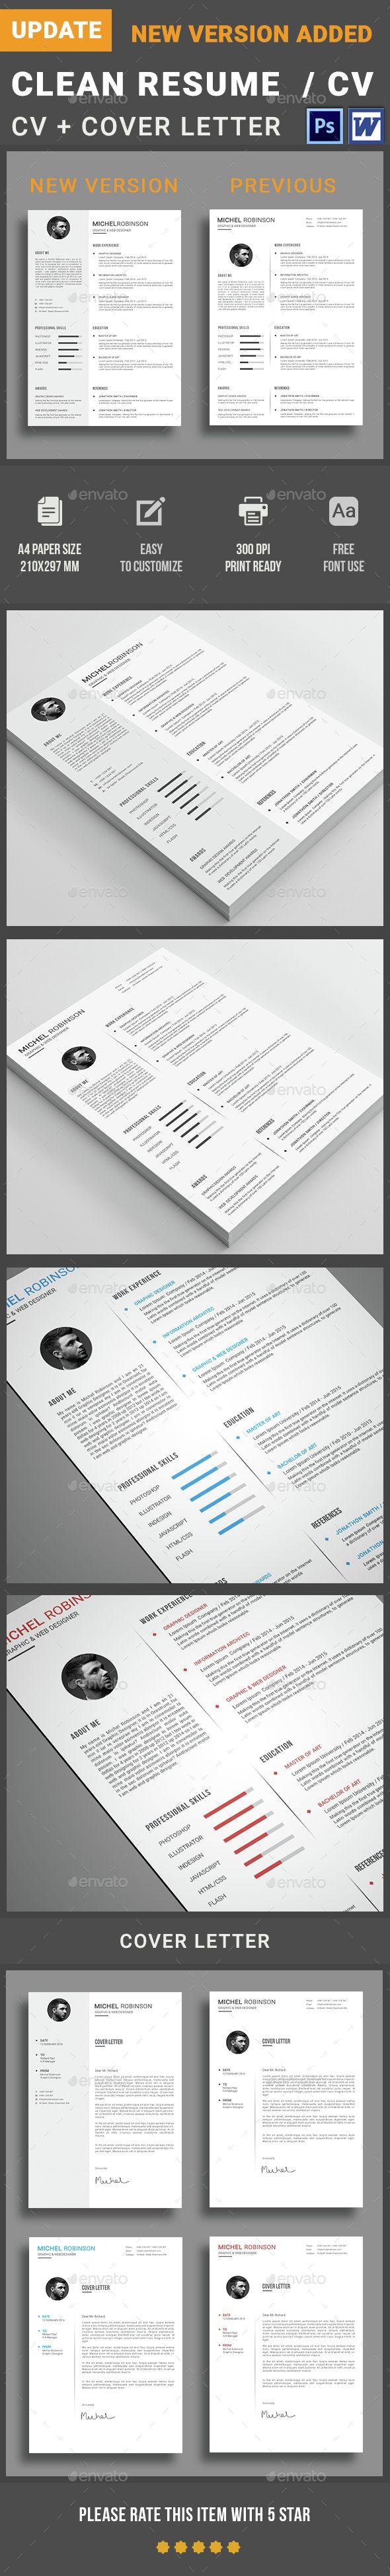 44 mejores imágenes en CV en Pinterest | Consejos útiles, Currículum ...